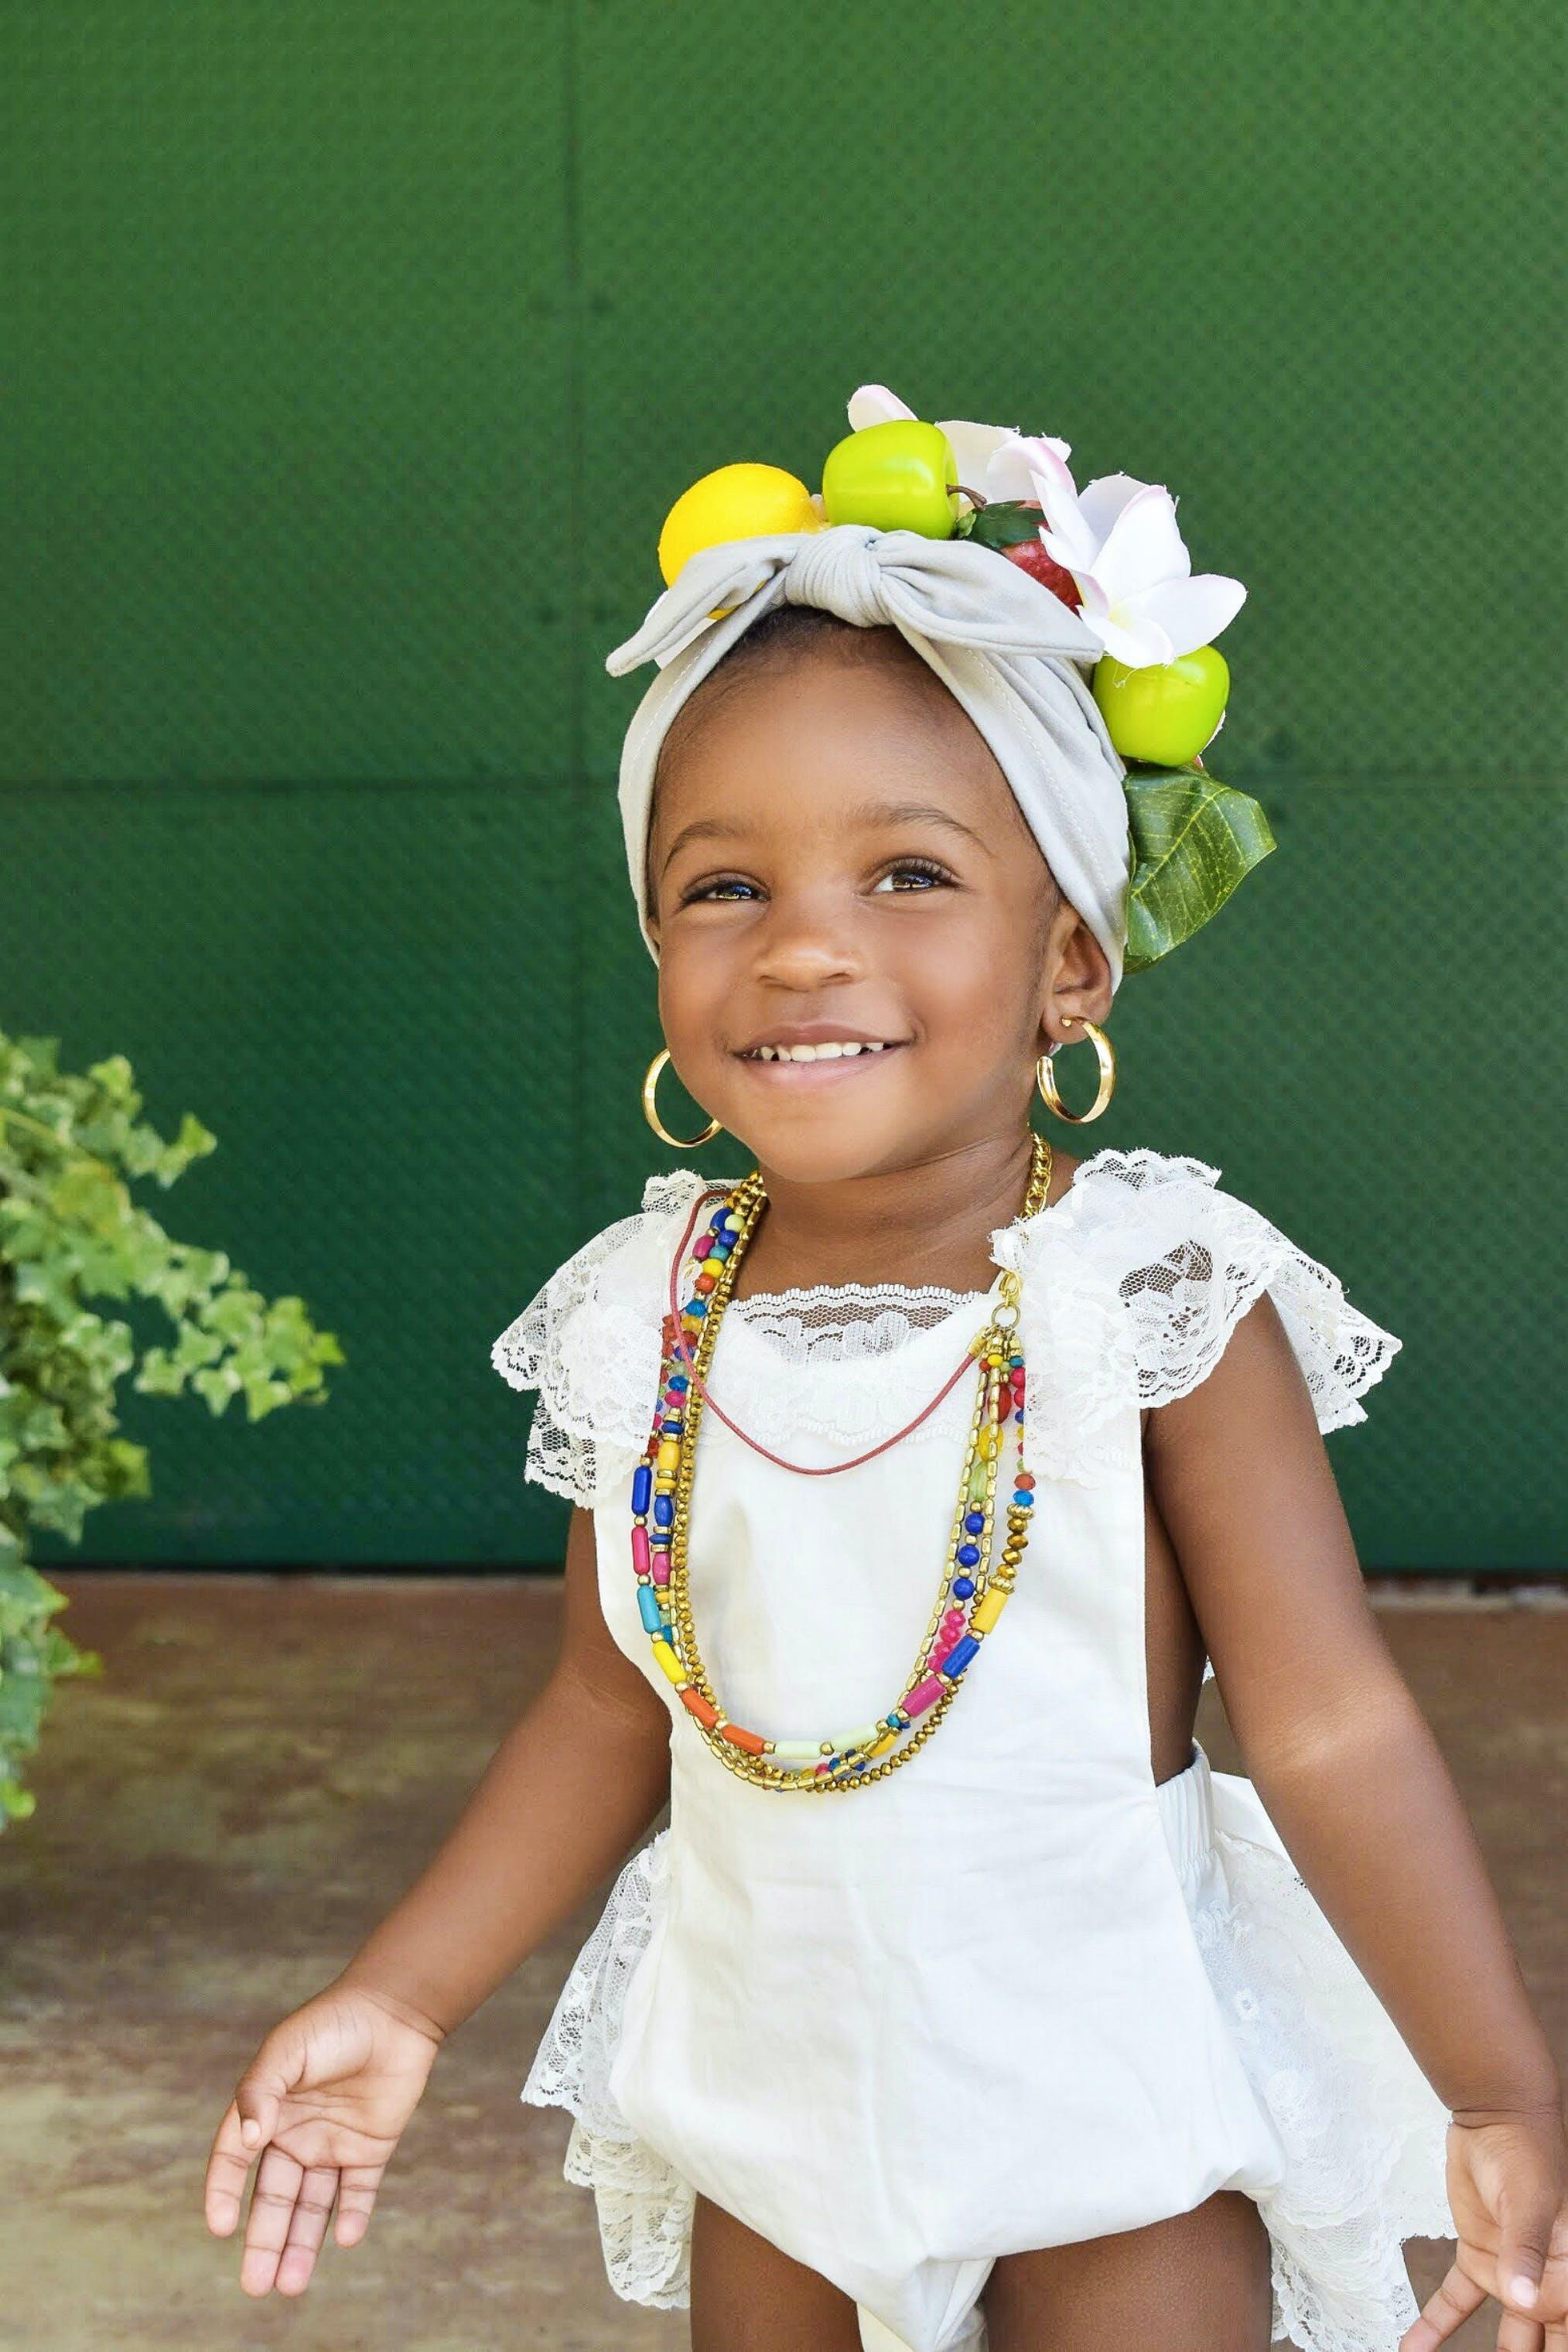 Girl Wearing White Lace Dress